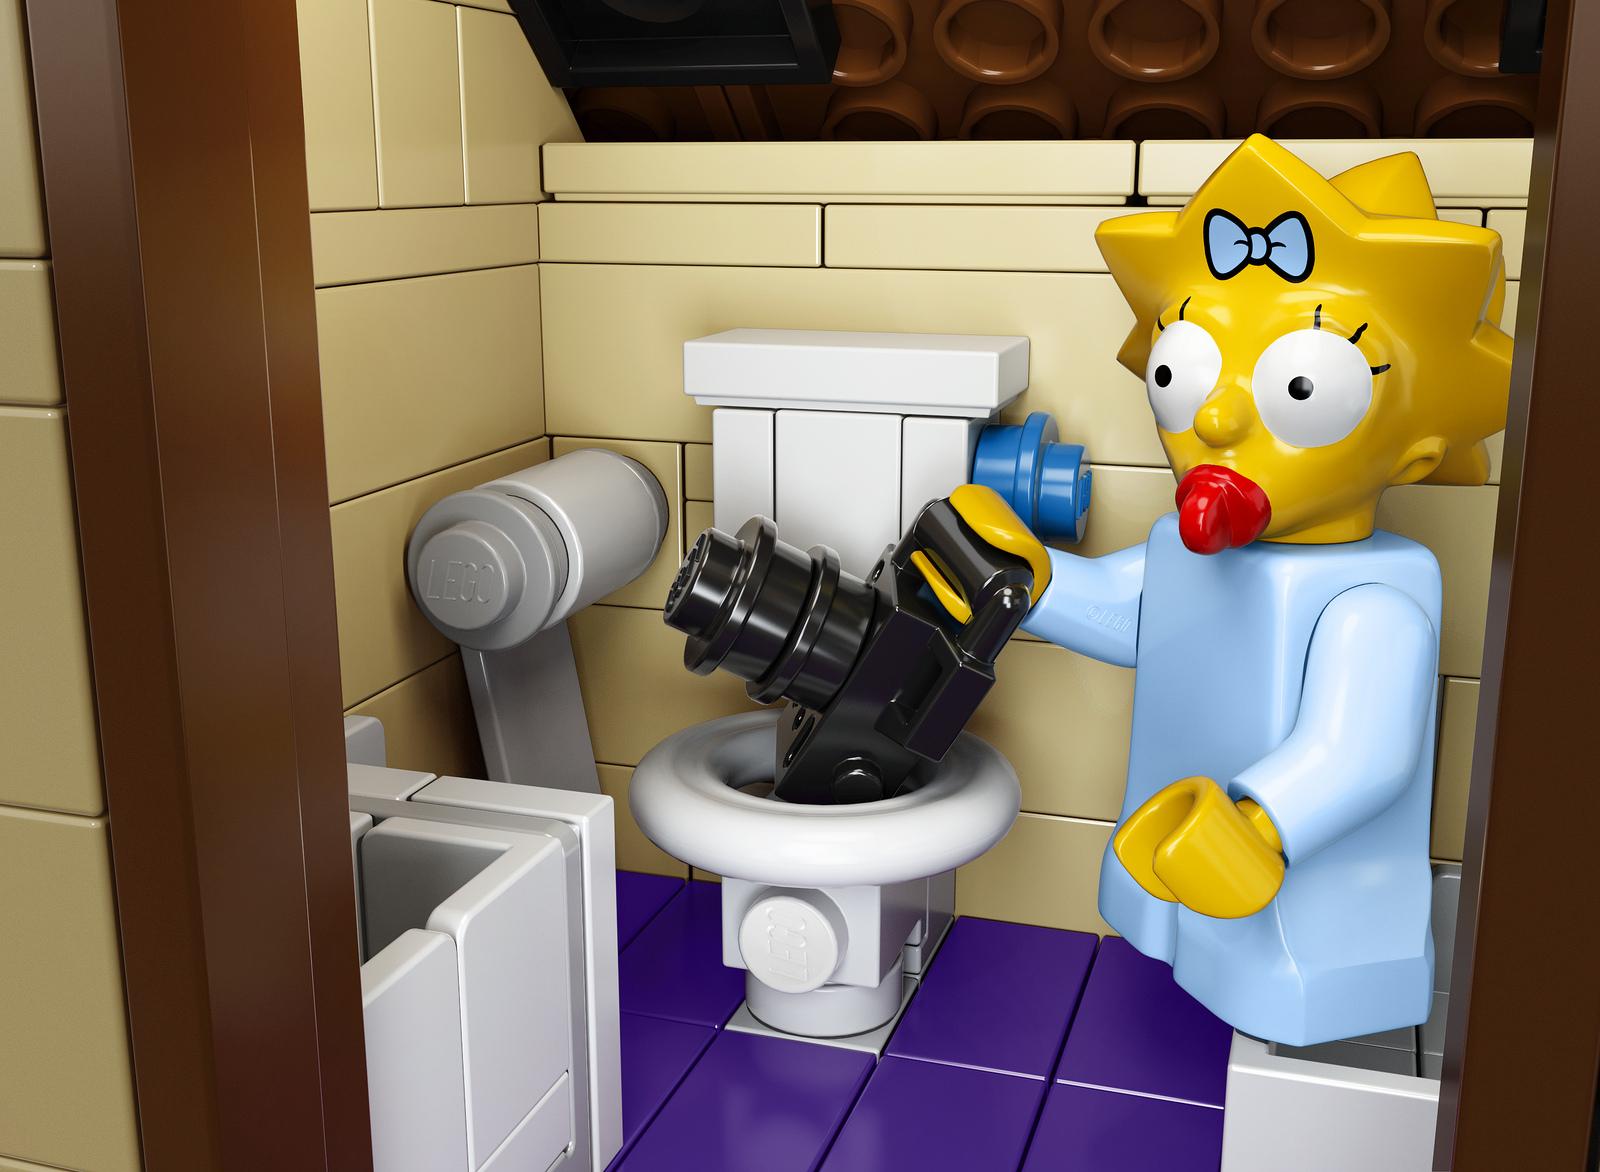 Maison-Lego-Simpsons-013